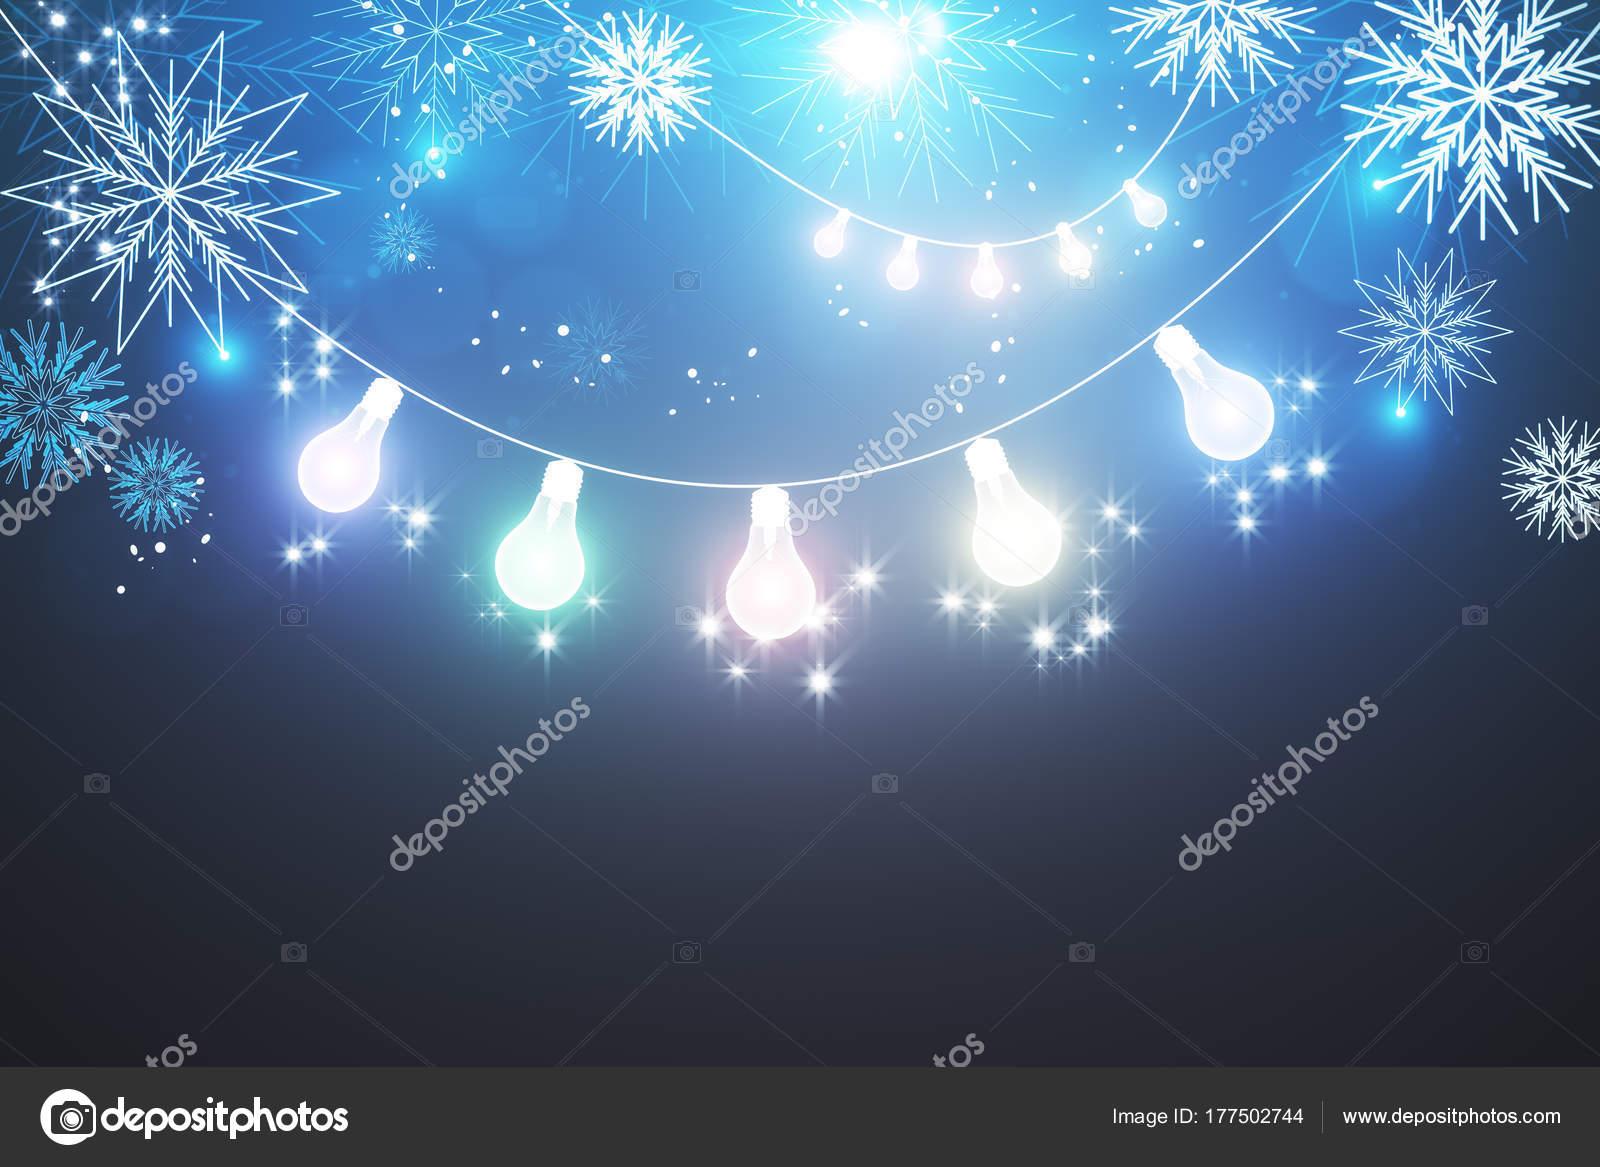 Leuchtende Weihnachten wallpaper — Stockfoto © peshkov #177502744